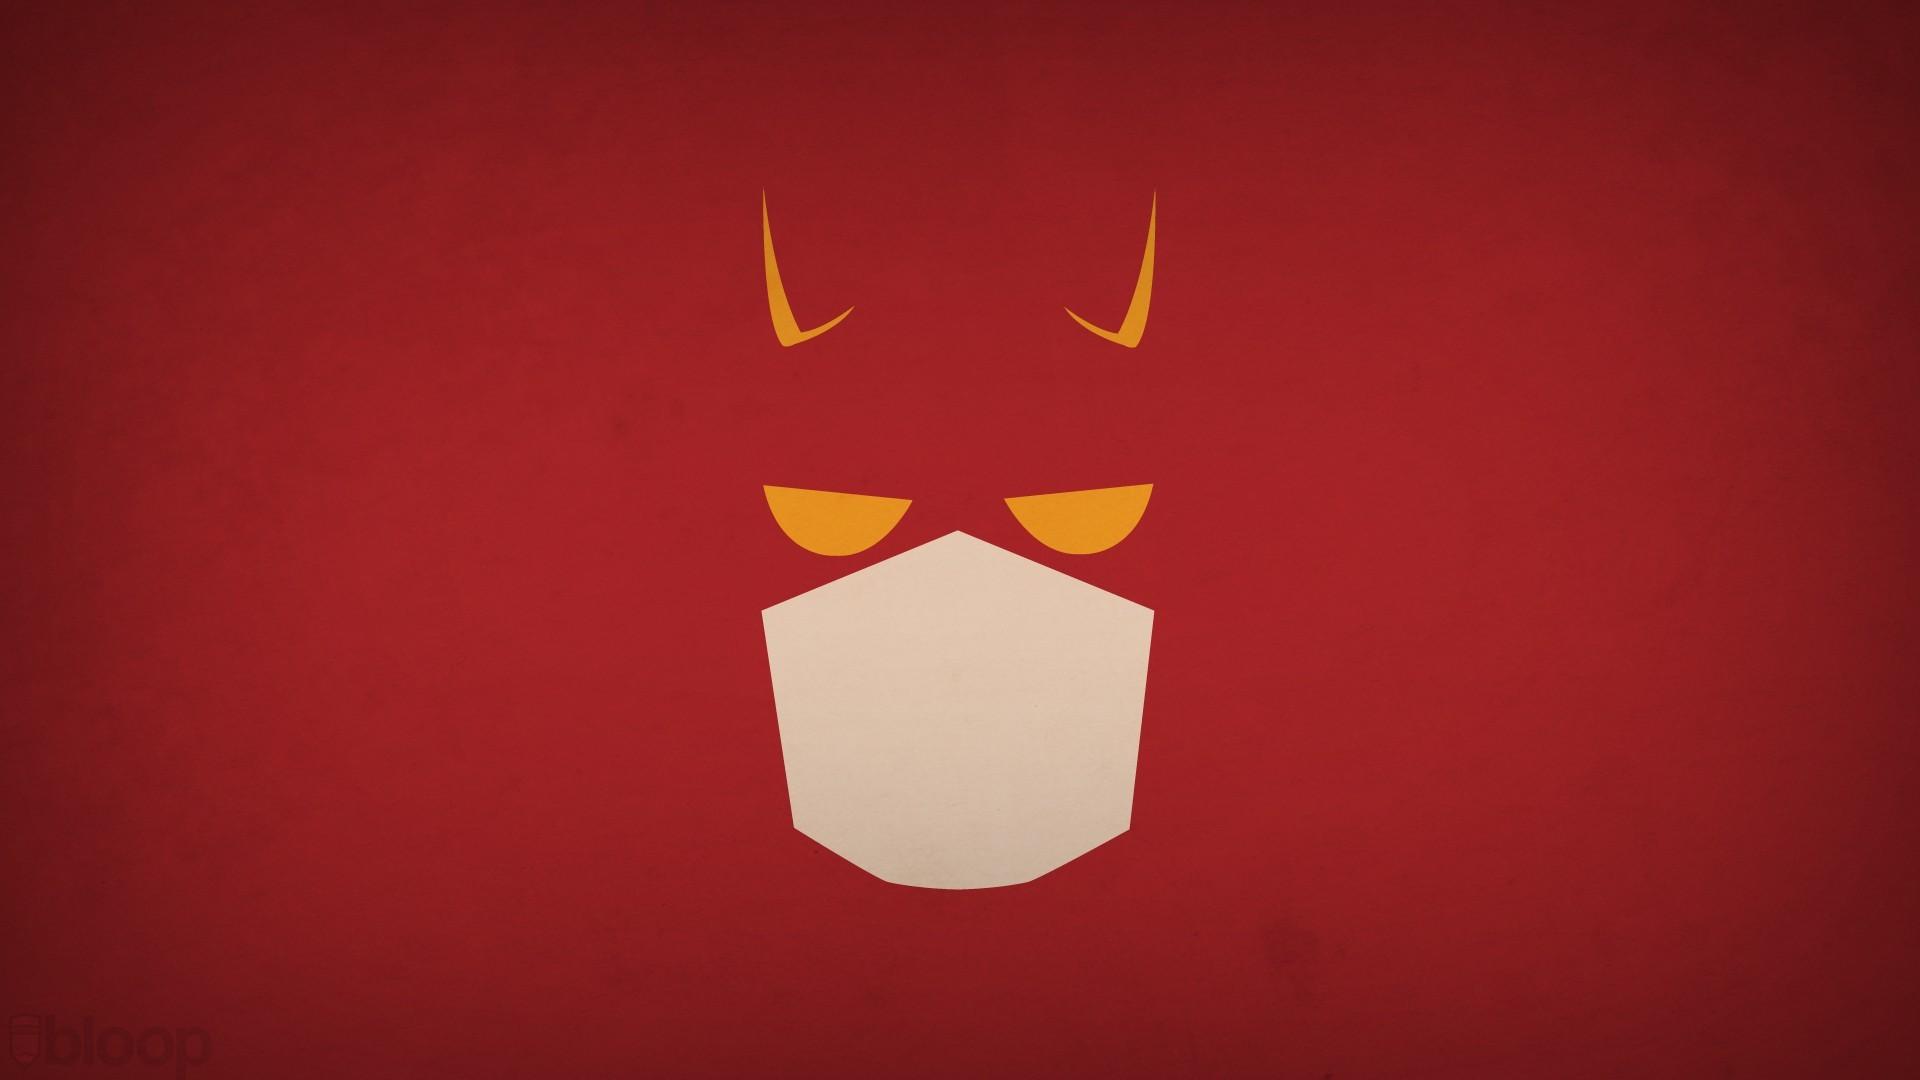 Minimalistic Superheroes Daredevil Red Background Blo0p